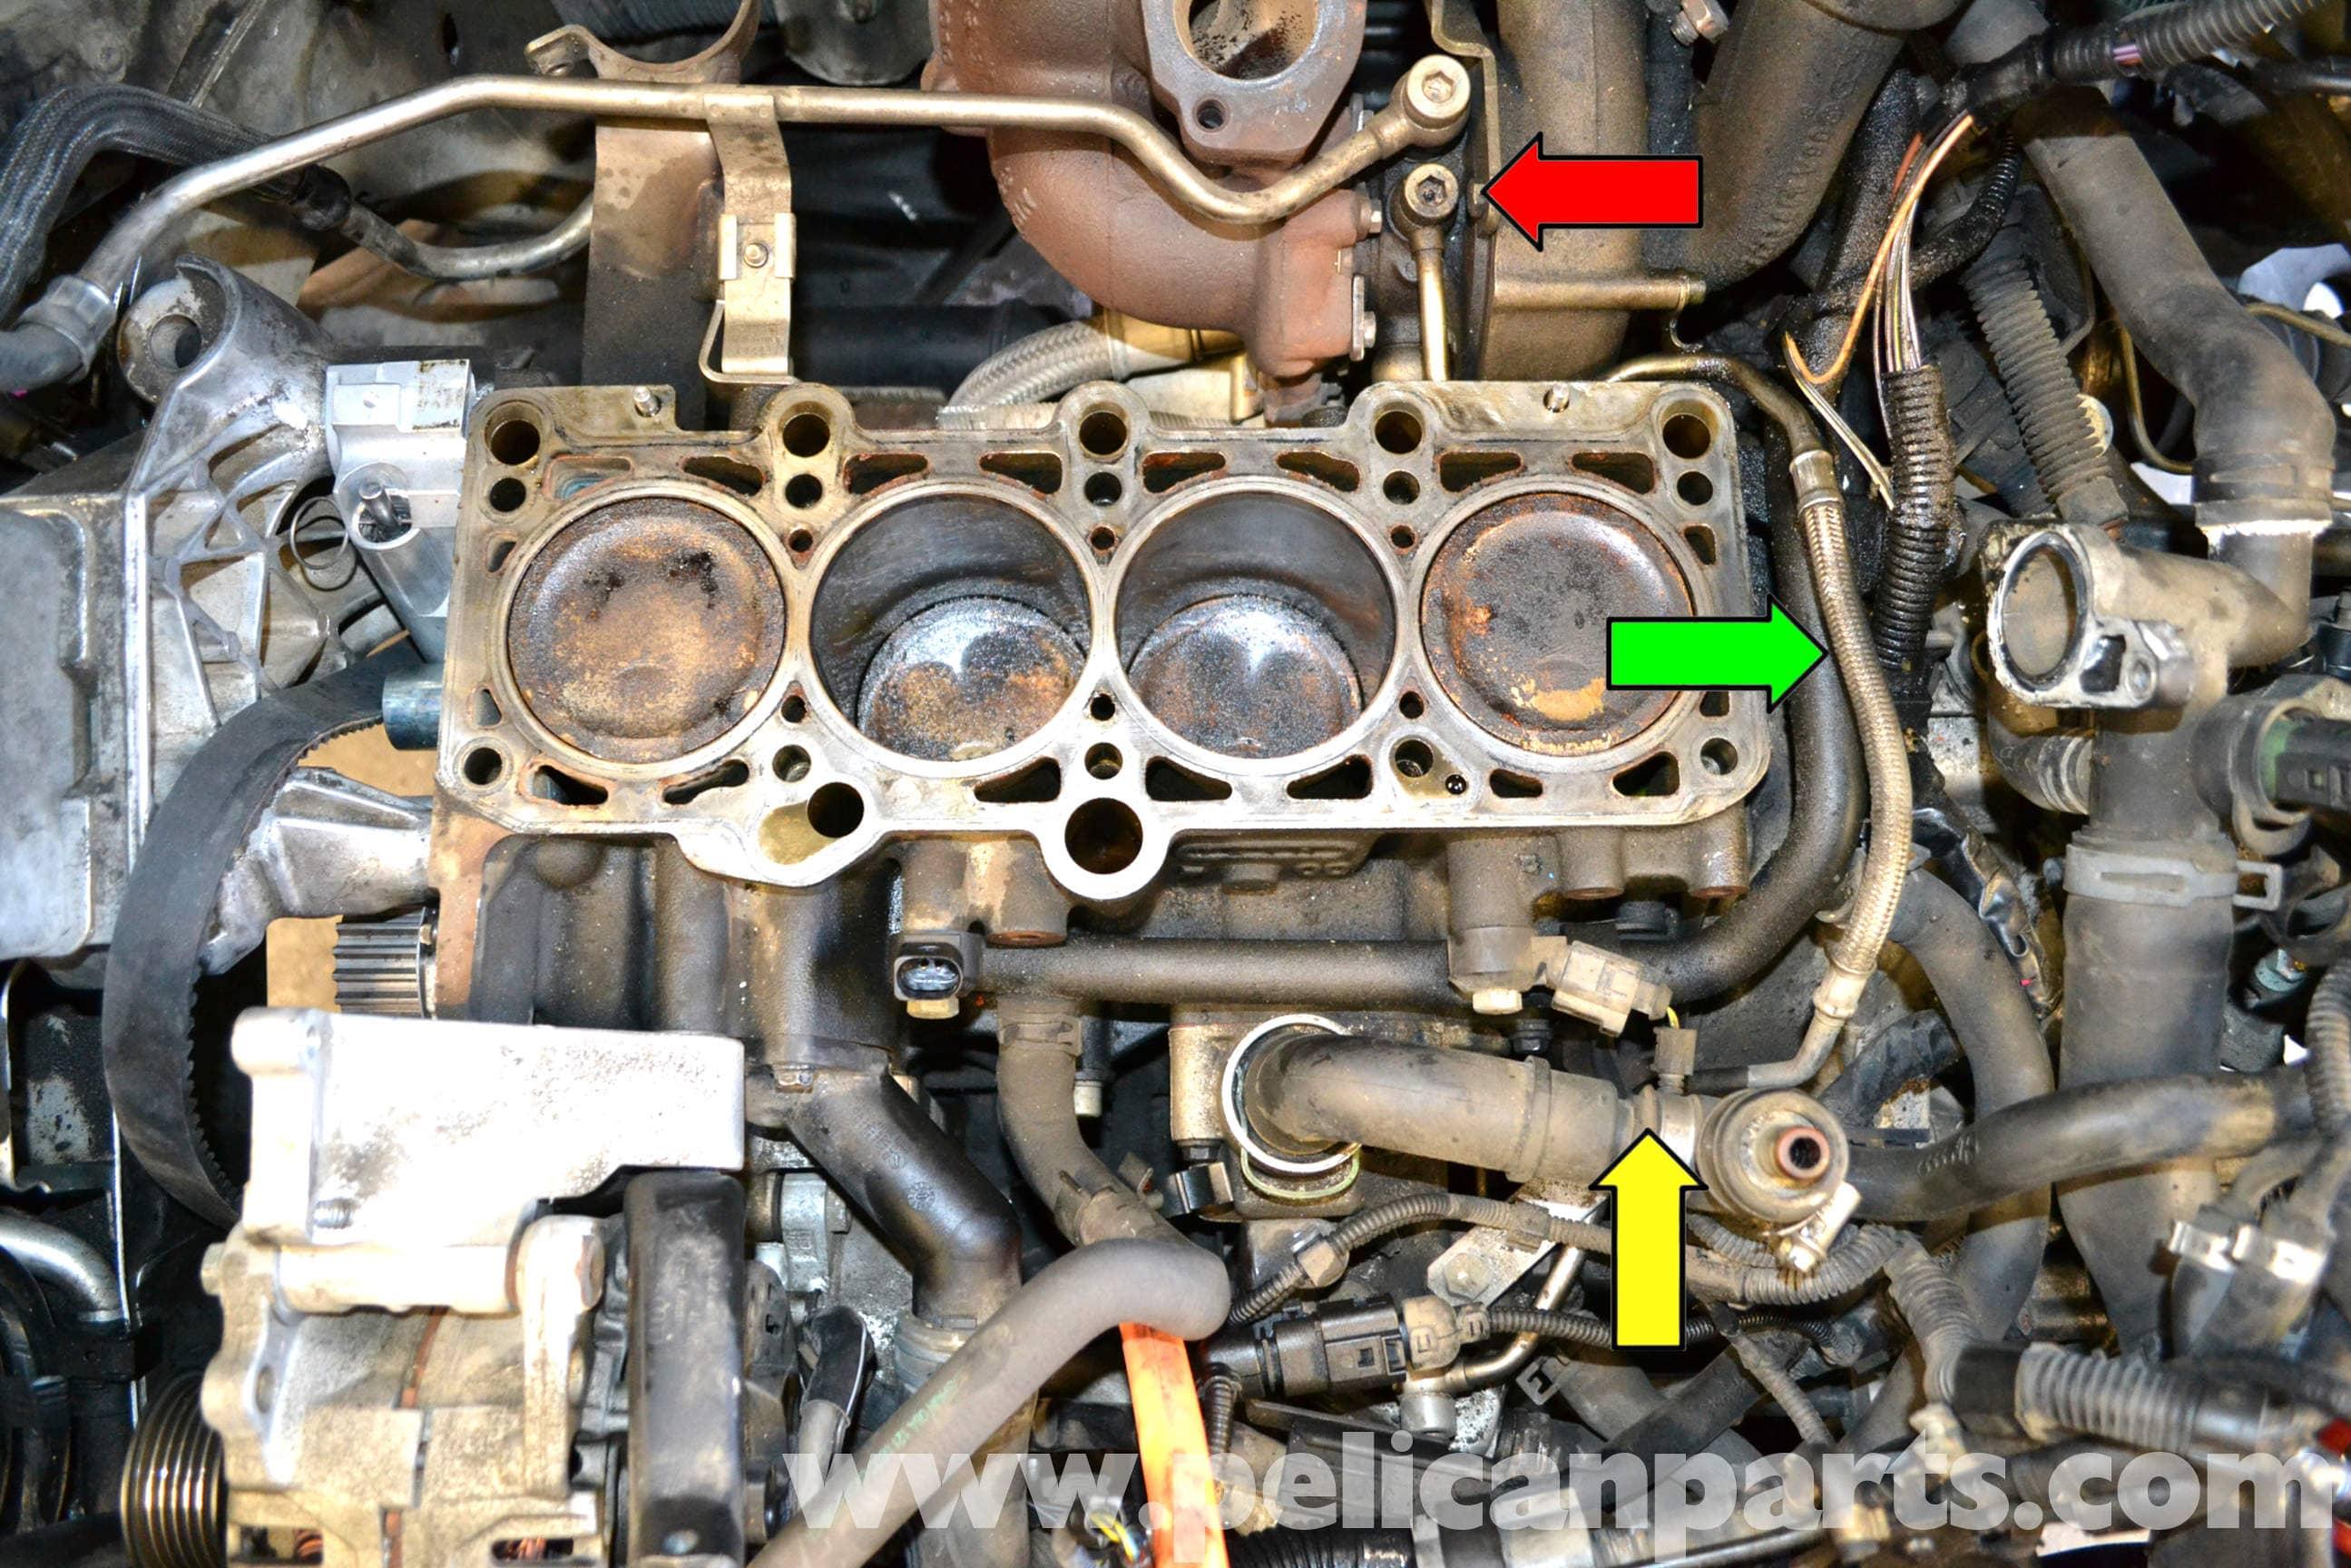 Volkswagen Golf Gti Mk Iv Turbo Replacement 1999 2005 Pelican Jetta 2 0 Engine Diagram Starter Large Image Extra